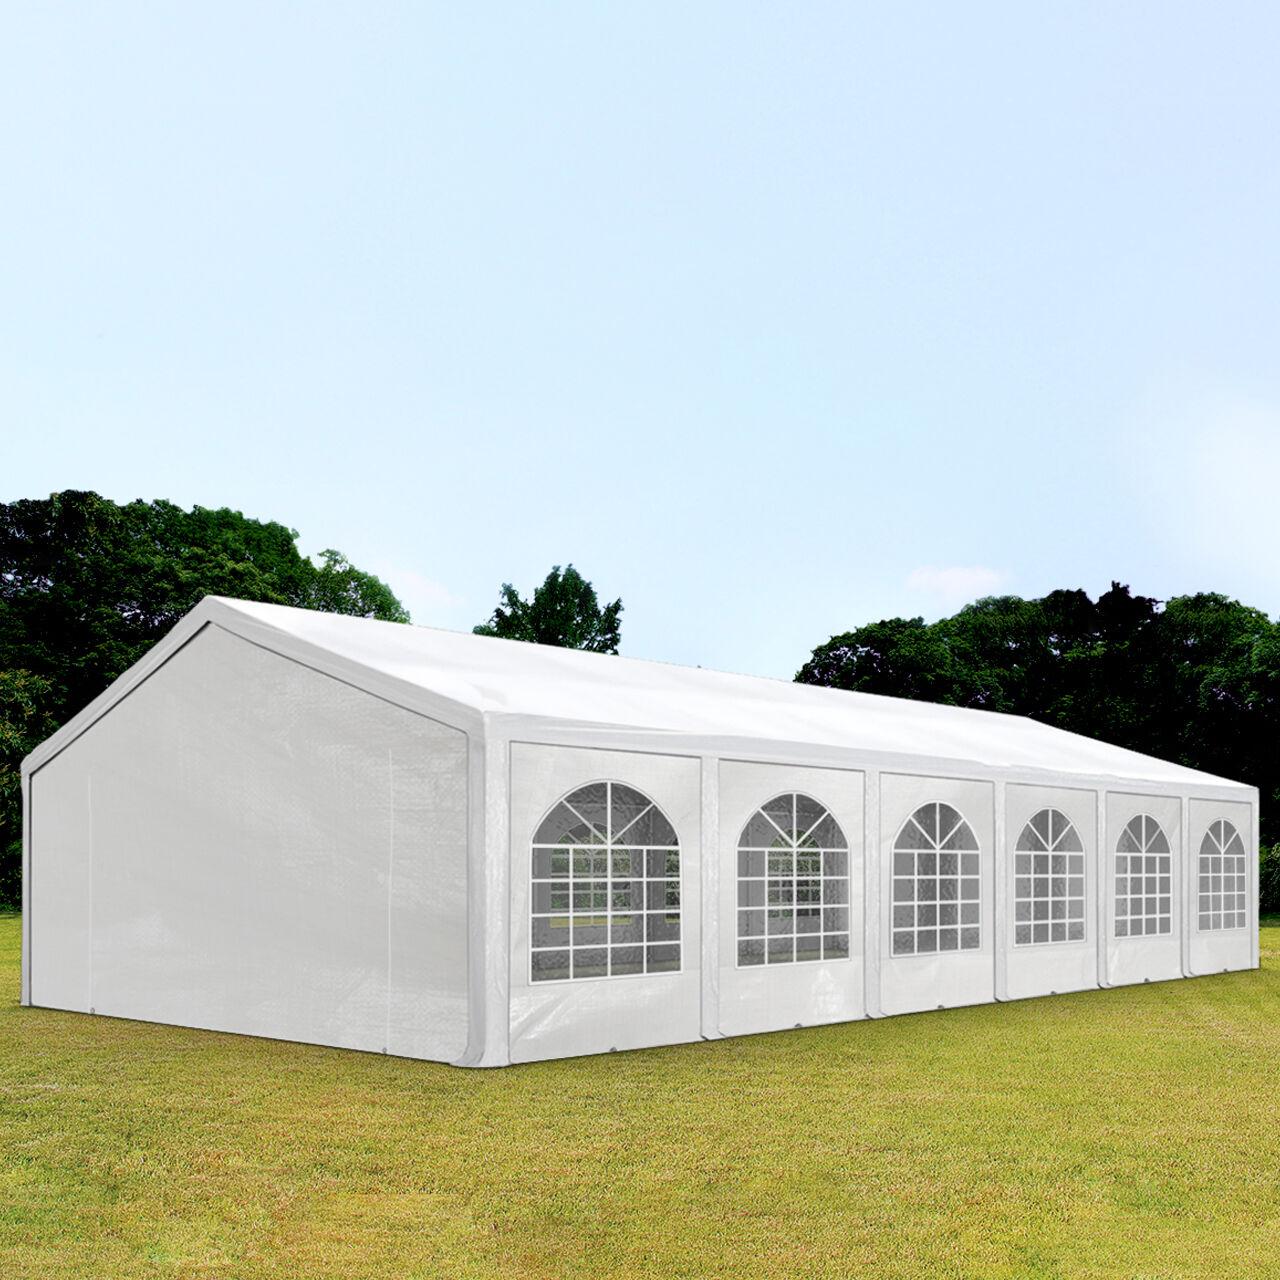 TOOLPORT Partyzelt 6x12m PE 240g/m² weiß wasserdicht Gartenzelt, Festzelt, Pavillon